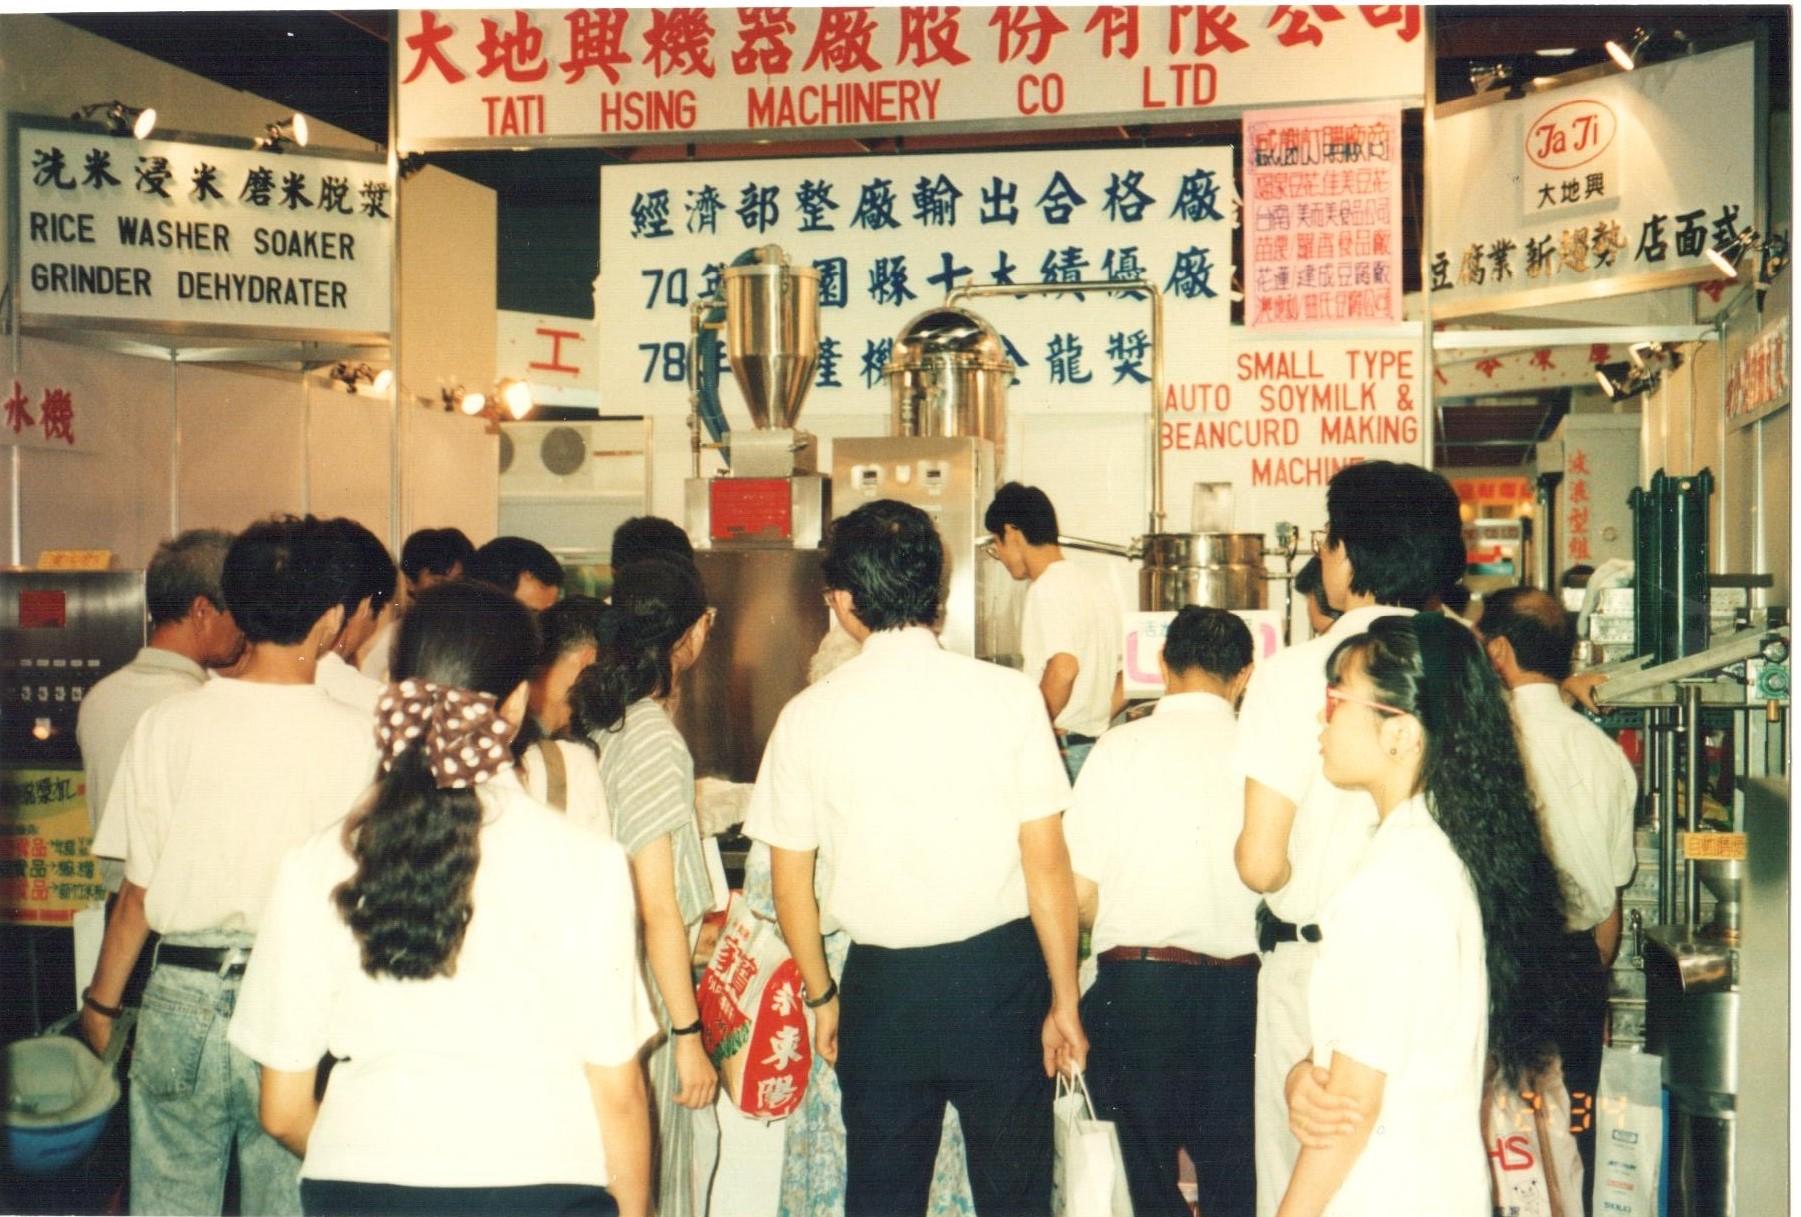 proimages/10_1990年_參加世貿食品機器展_公司自動化機器大獲好評.jpg